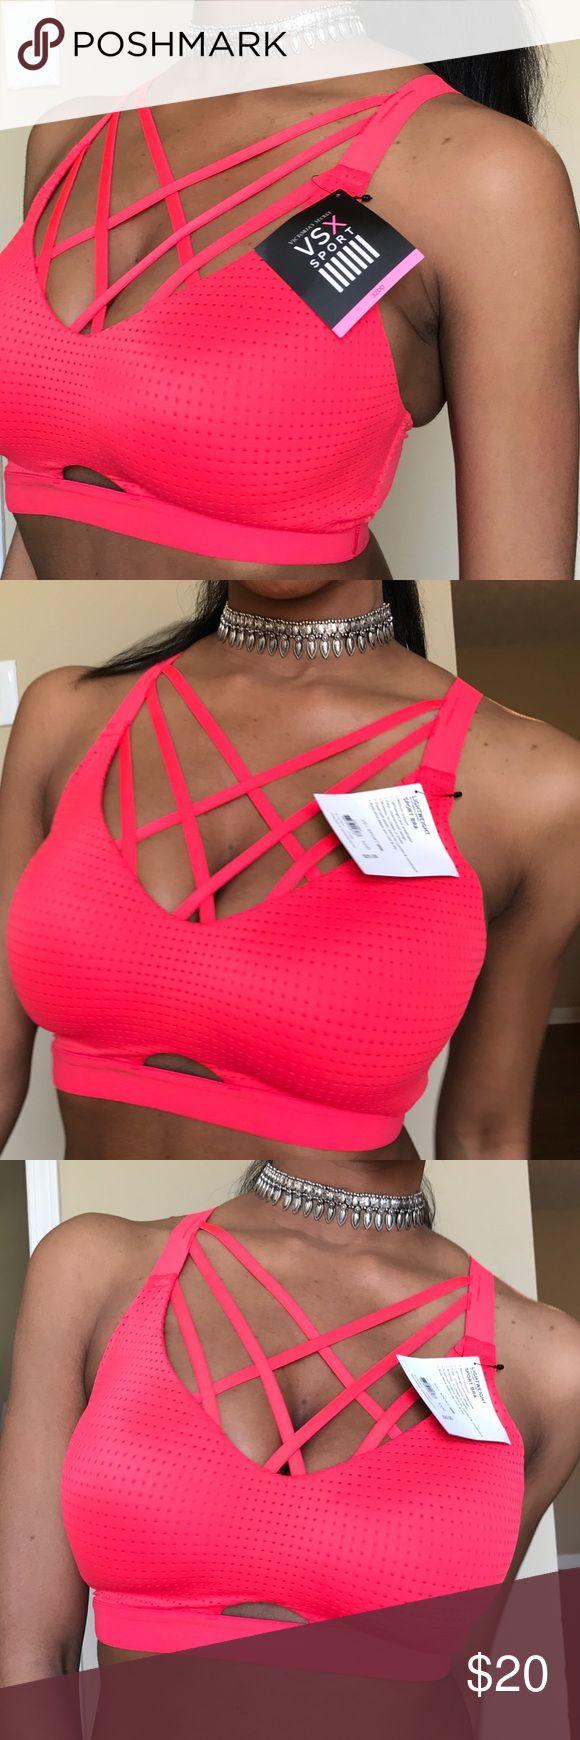 Victoria's Secret Lightweight  Red Sport Bra Strappy! Racer back. Super Comfy. Red. Victoria's Secret Intimates & Sleepwear Bras